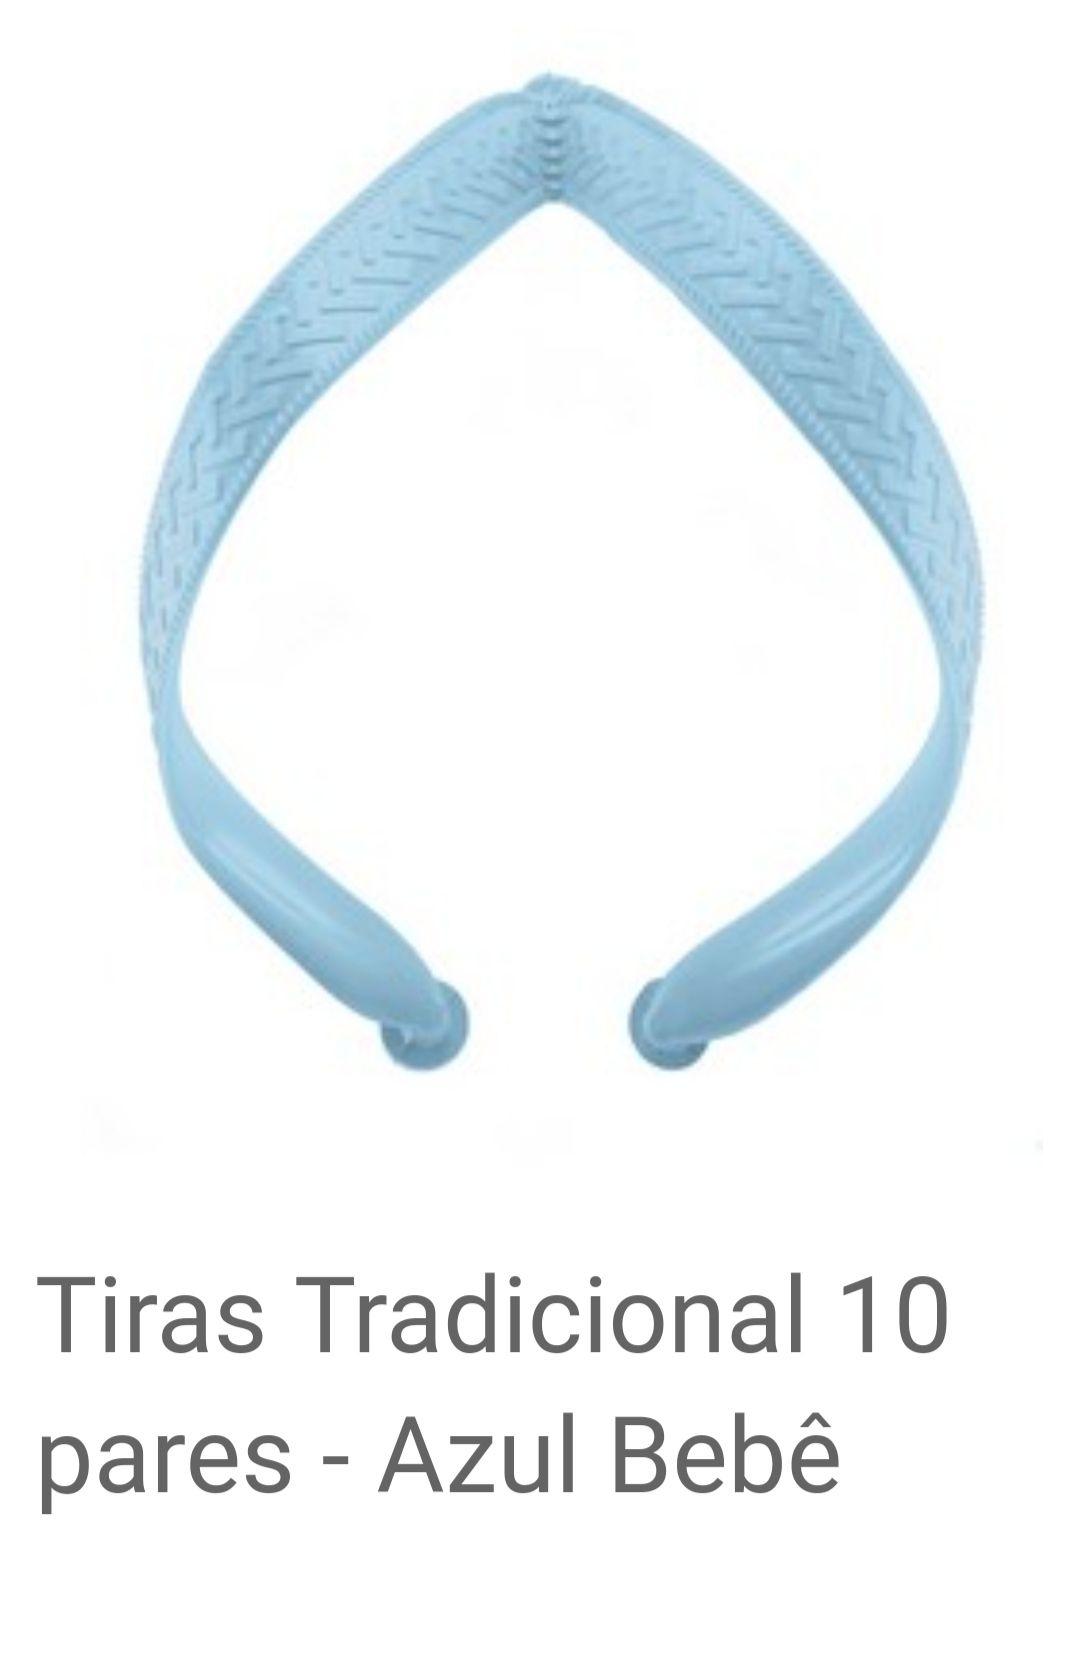 TIRAS MODELO TRADICIOANL COM 10 PARES